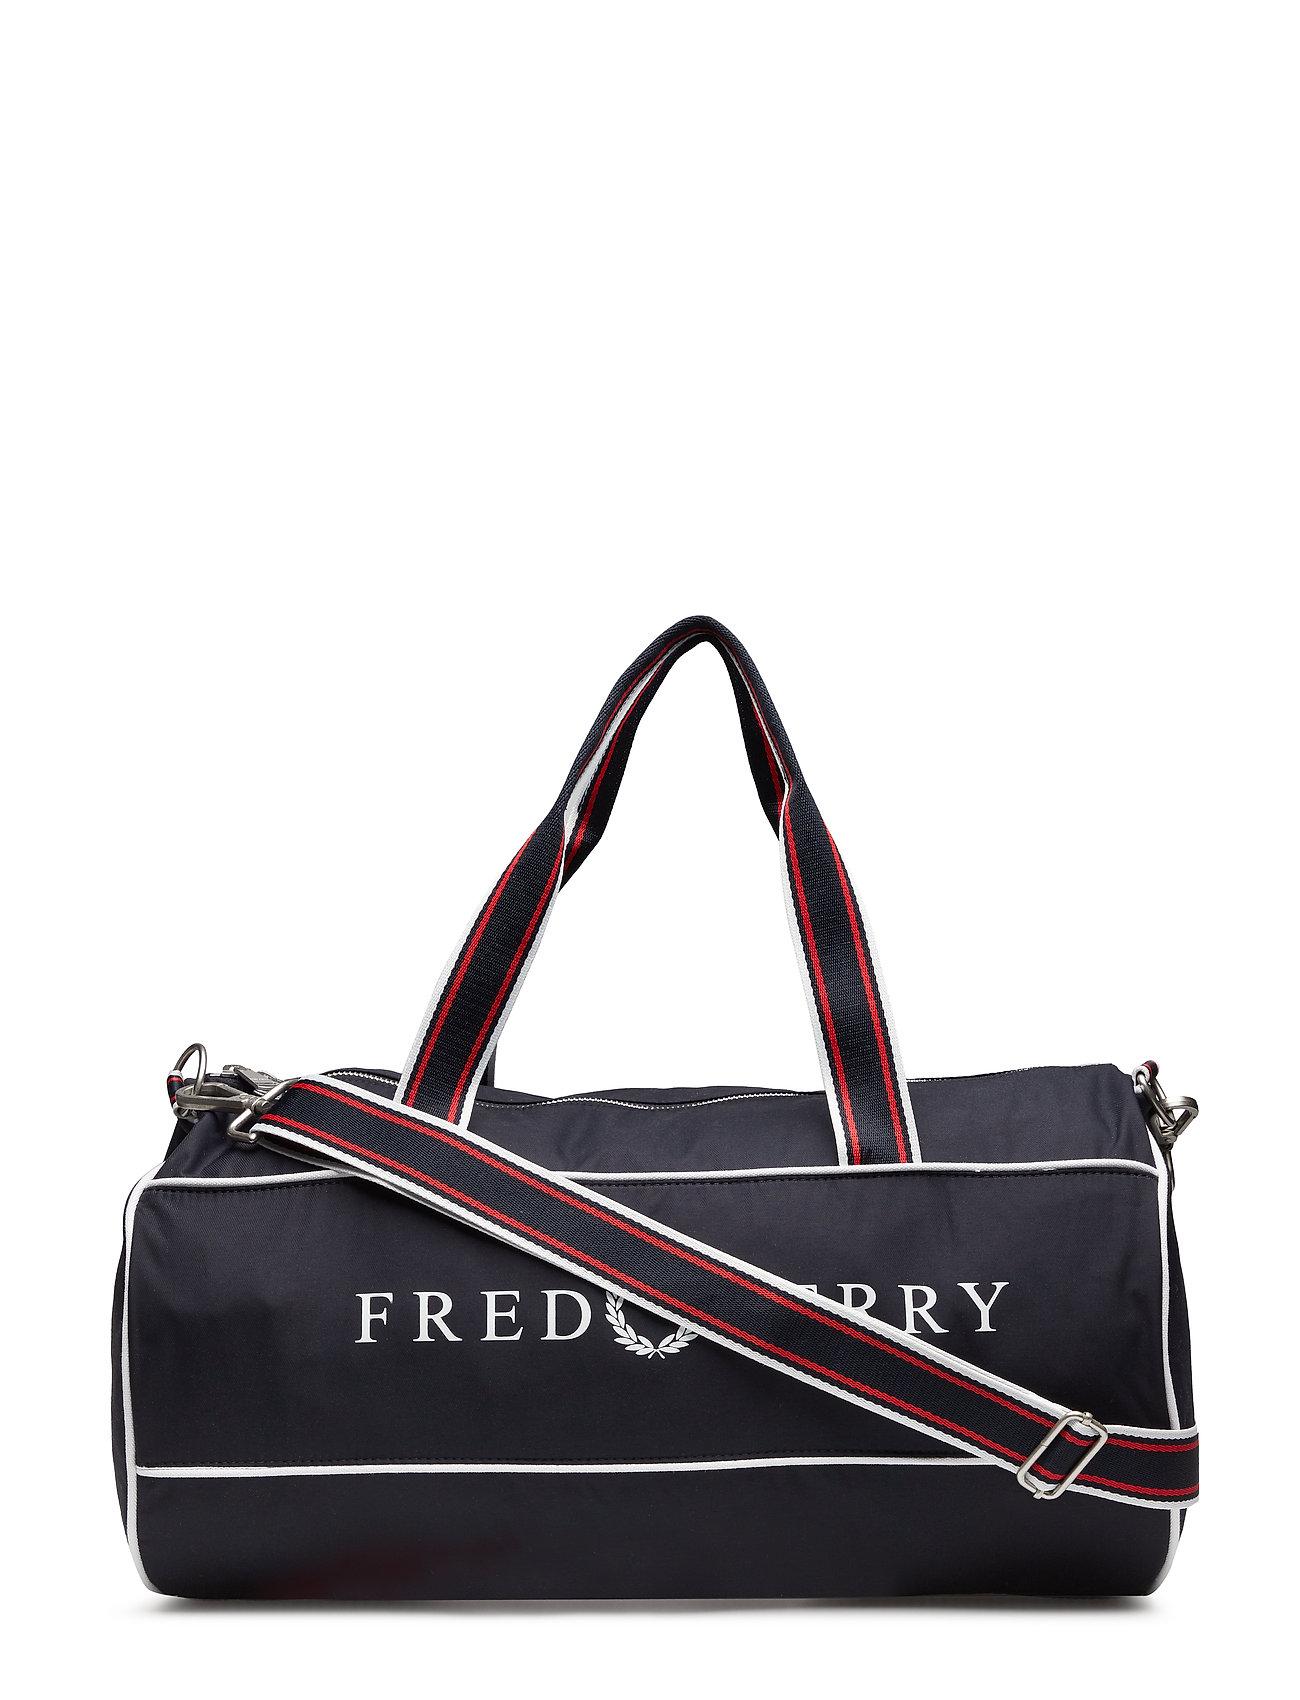 Fred Perry RETRO BARREL BAG